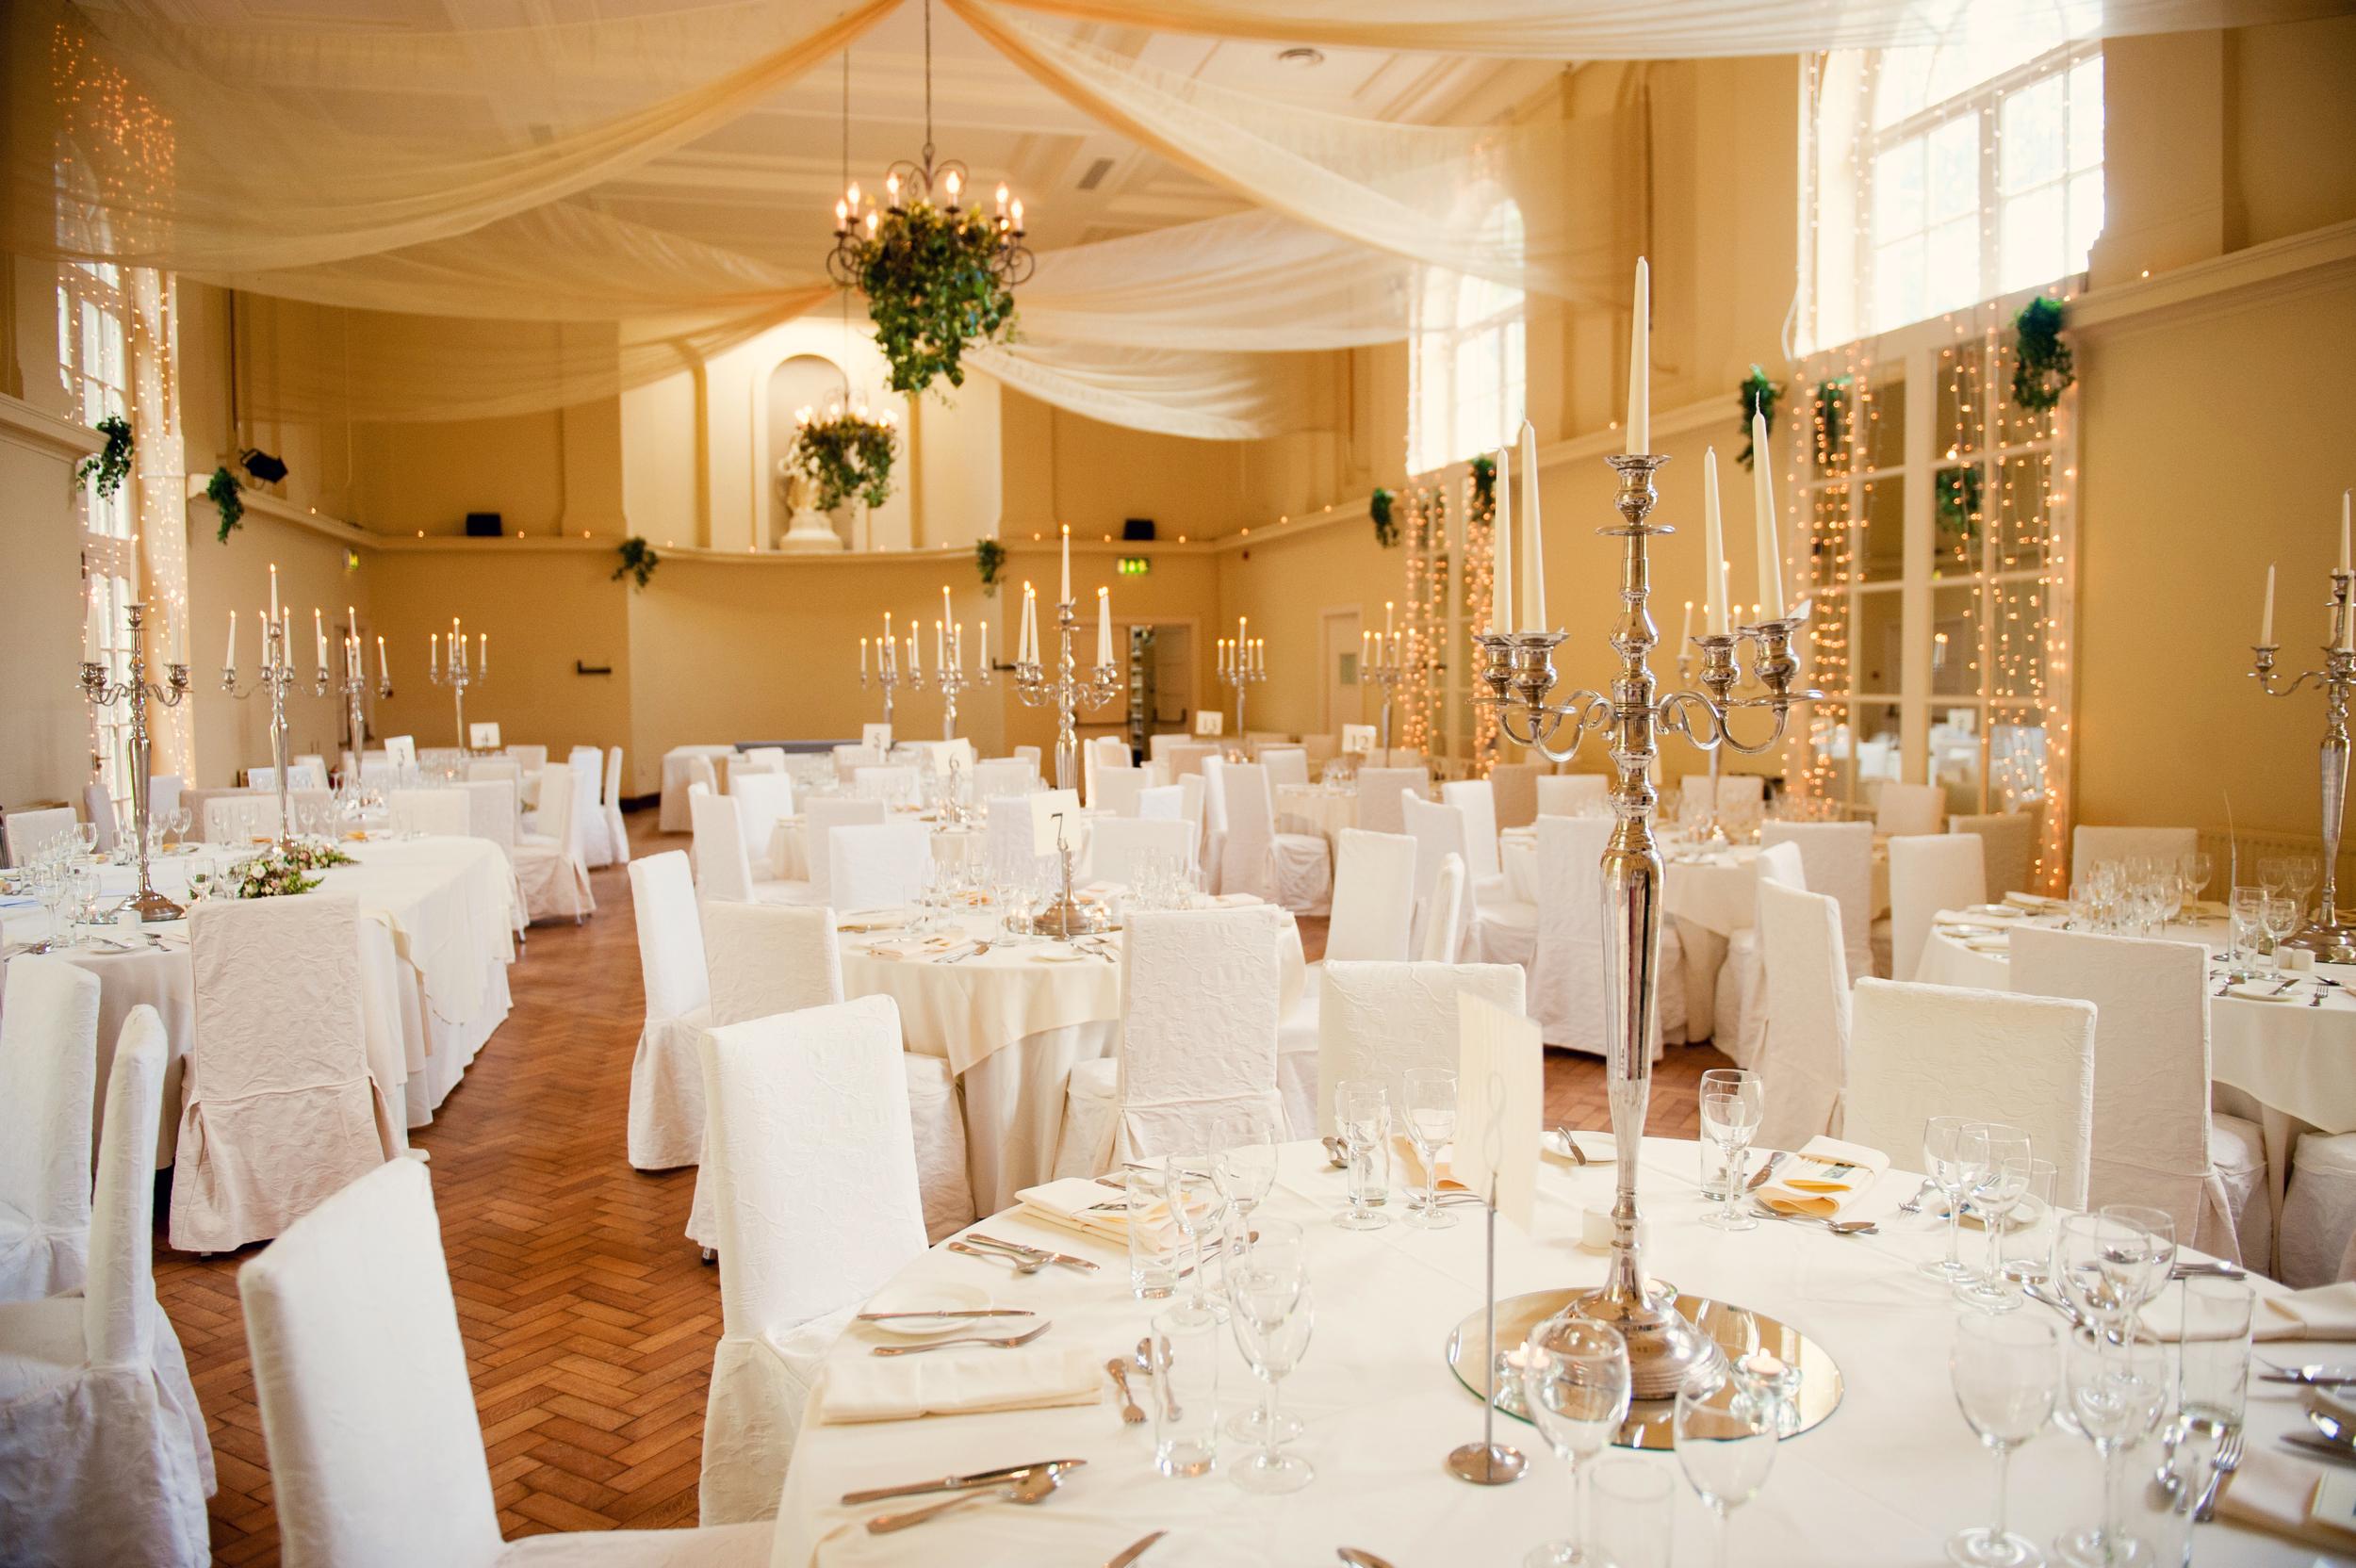 Dining room at Kilshane House - Photography:  Weddings by KARA  © - Wedding Location: Kilshane House, Tipperary, Ireland